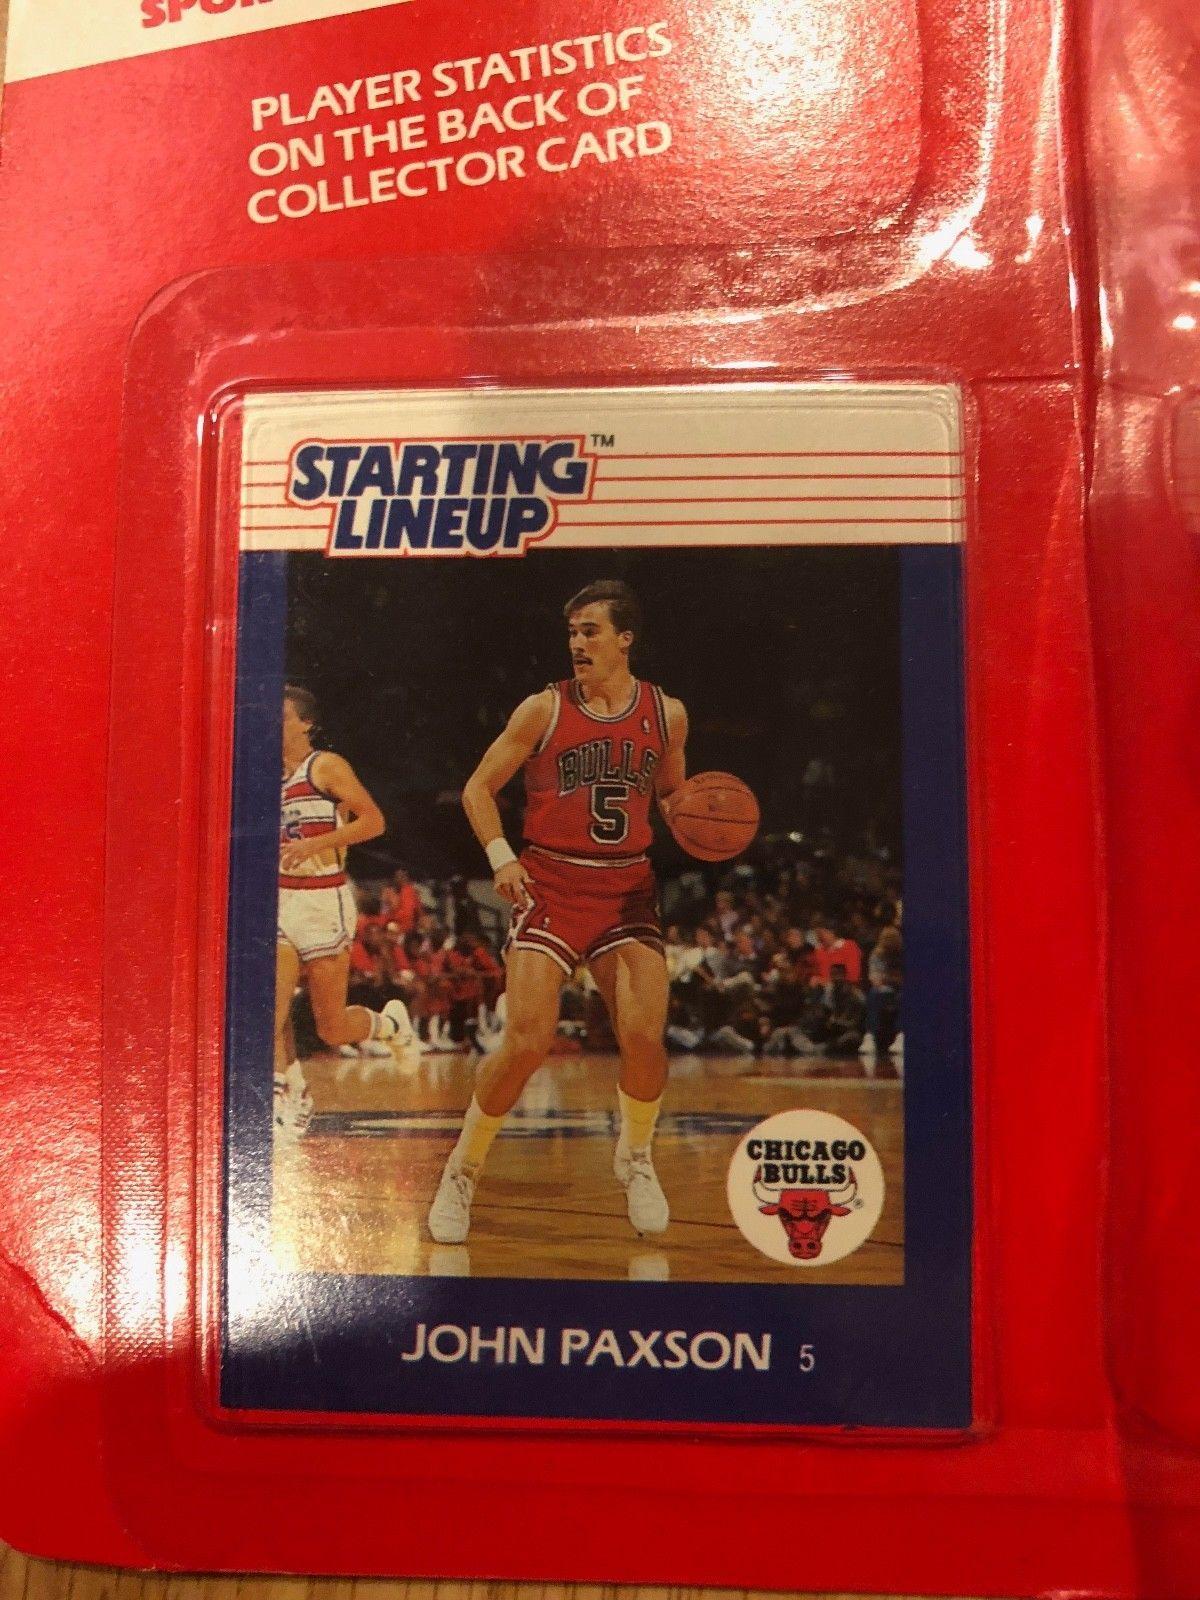 RARE JOHN PAXSON Signed Chicago Bulls Starting Lineup Action Figure PHOTO PROOF